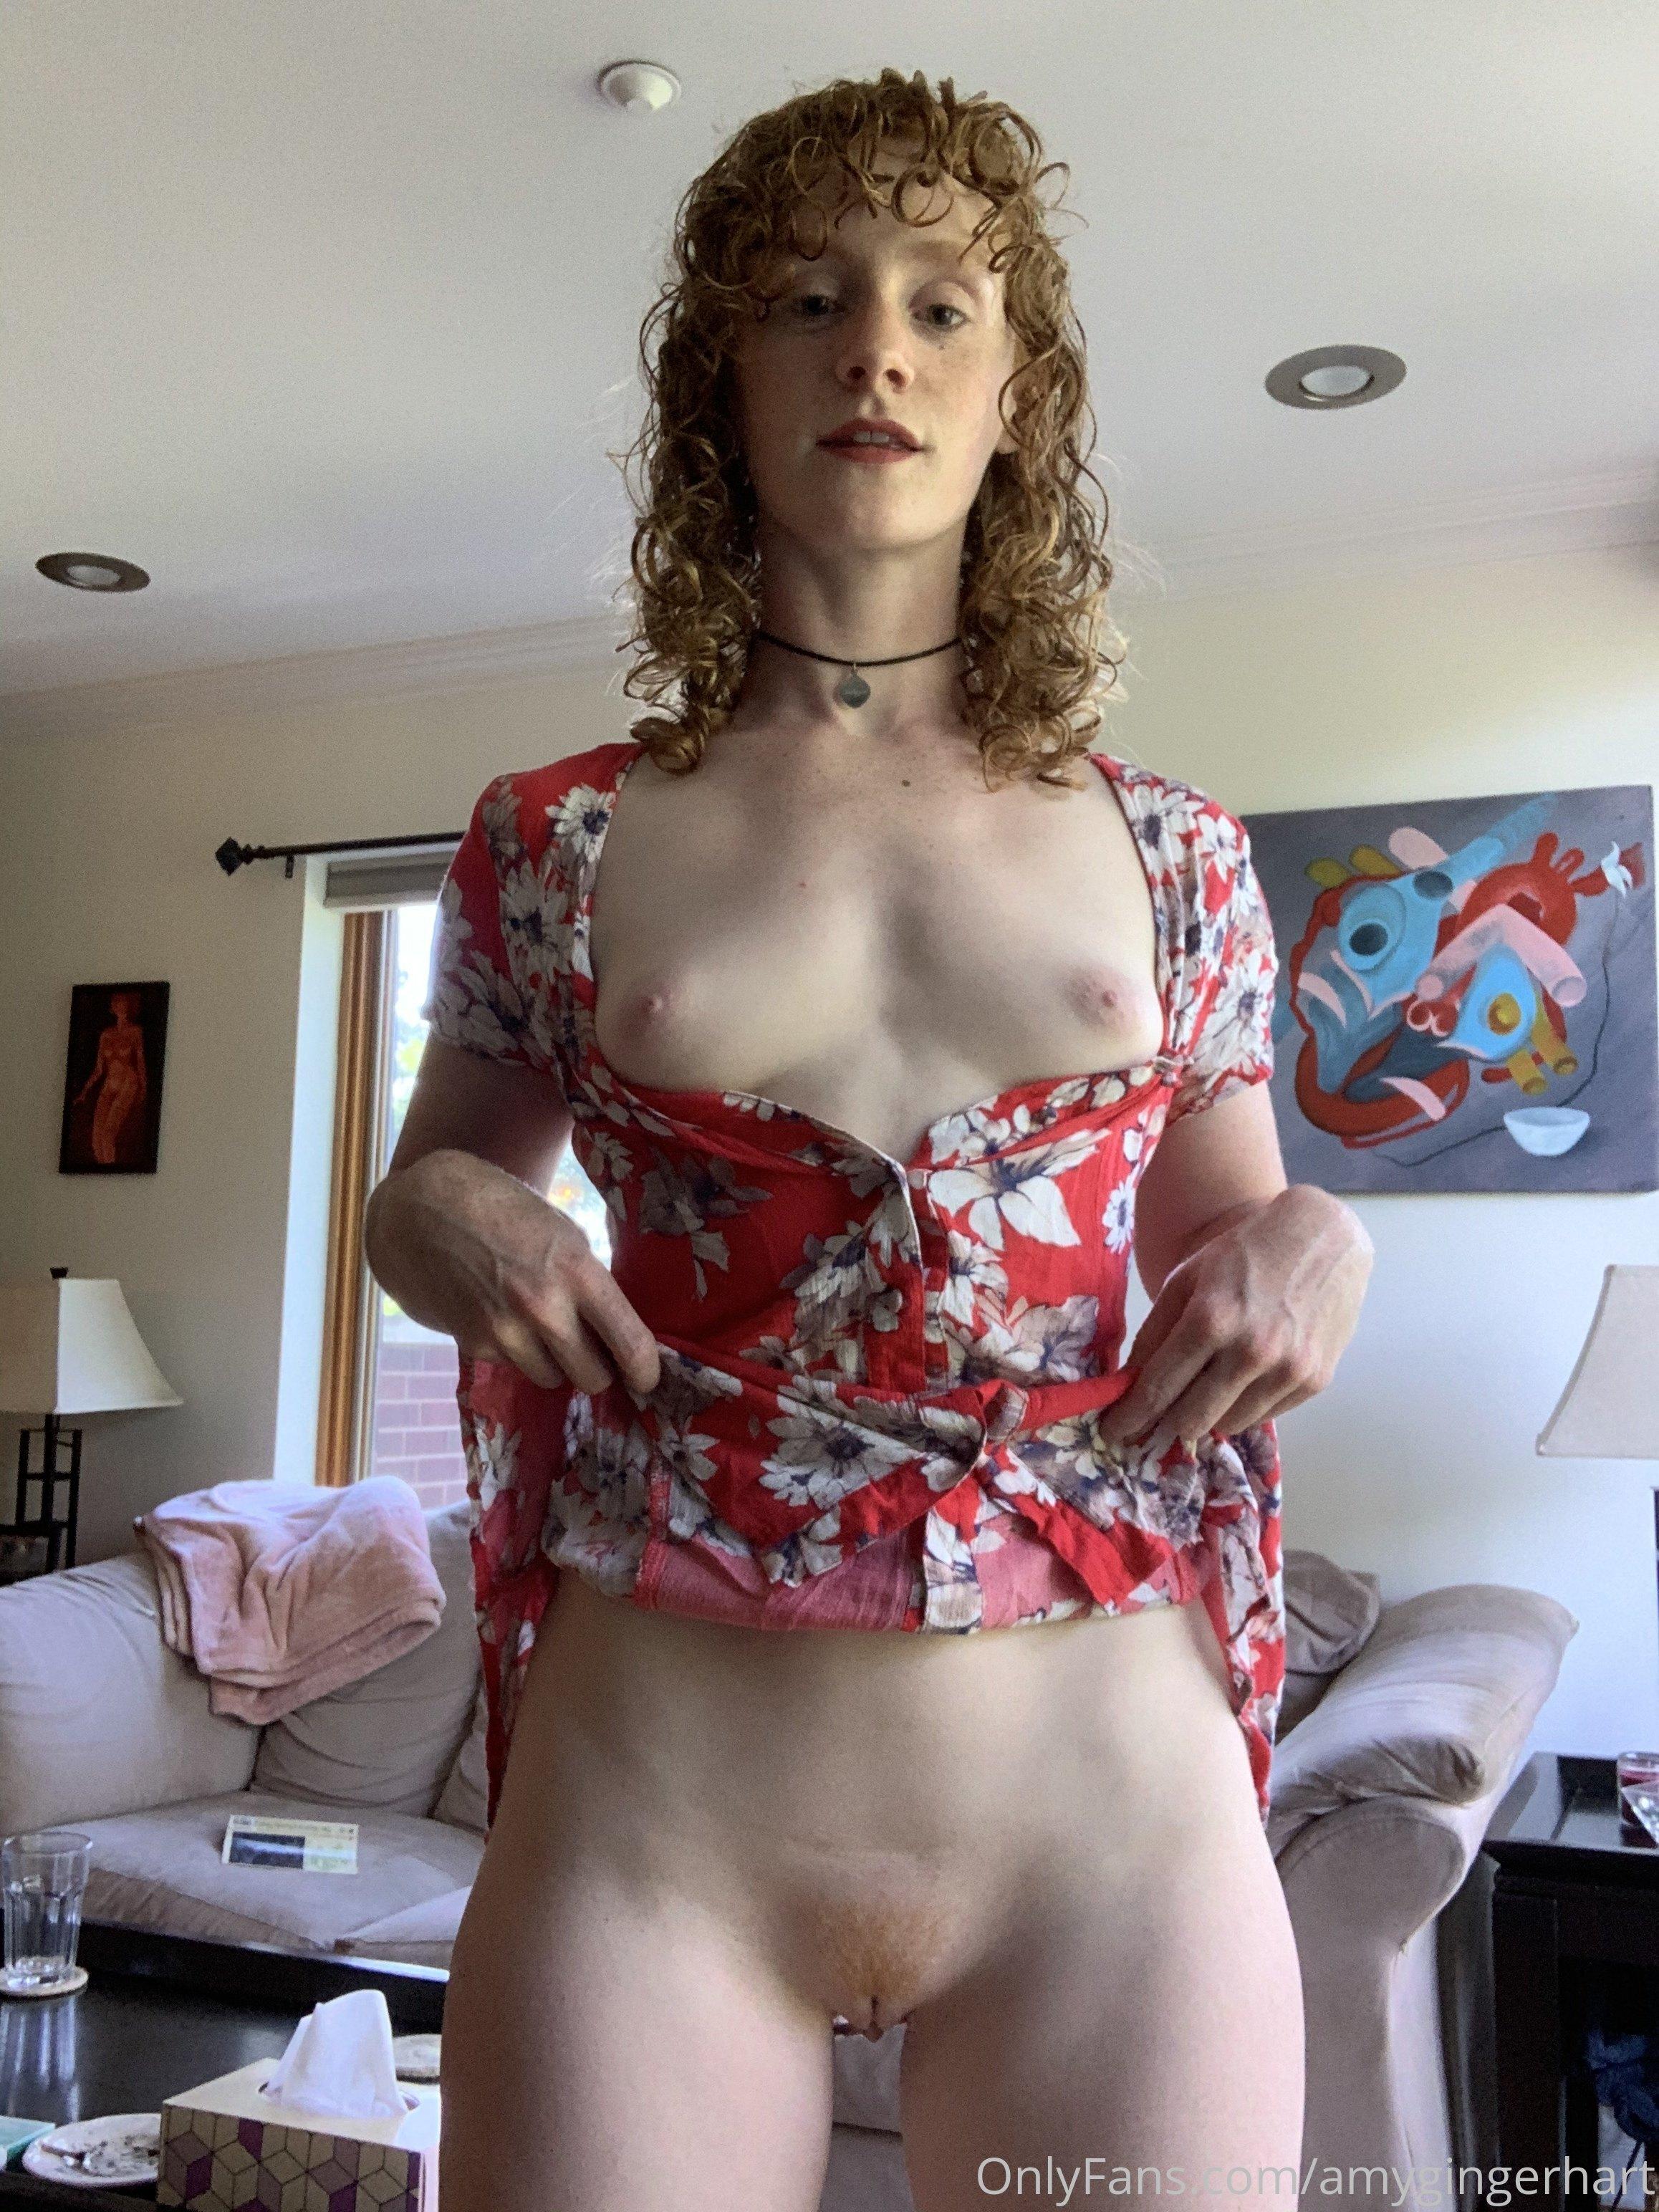 Amy Hart, Amygingerhart, Onlyfans 0312